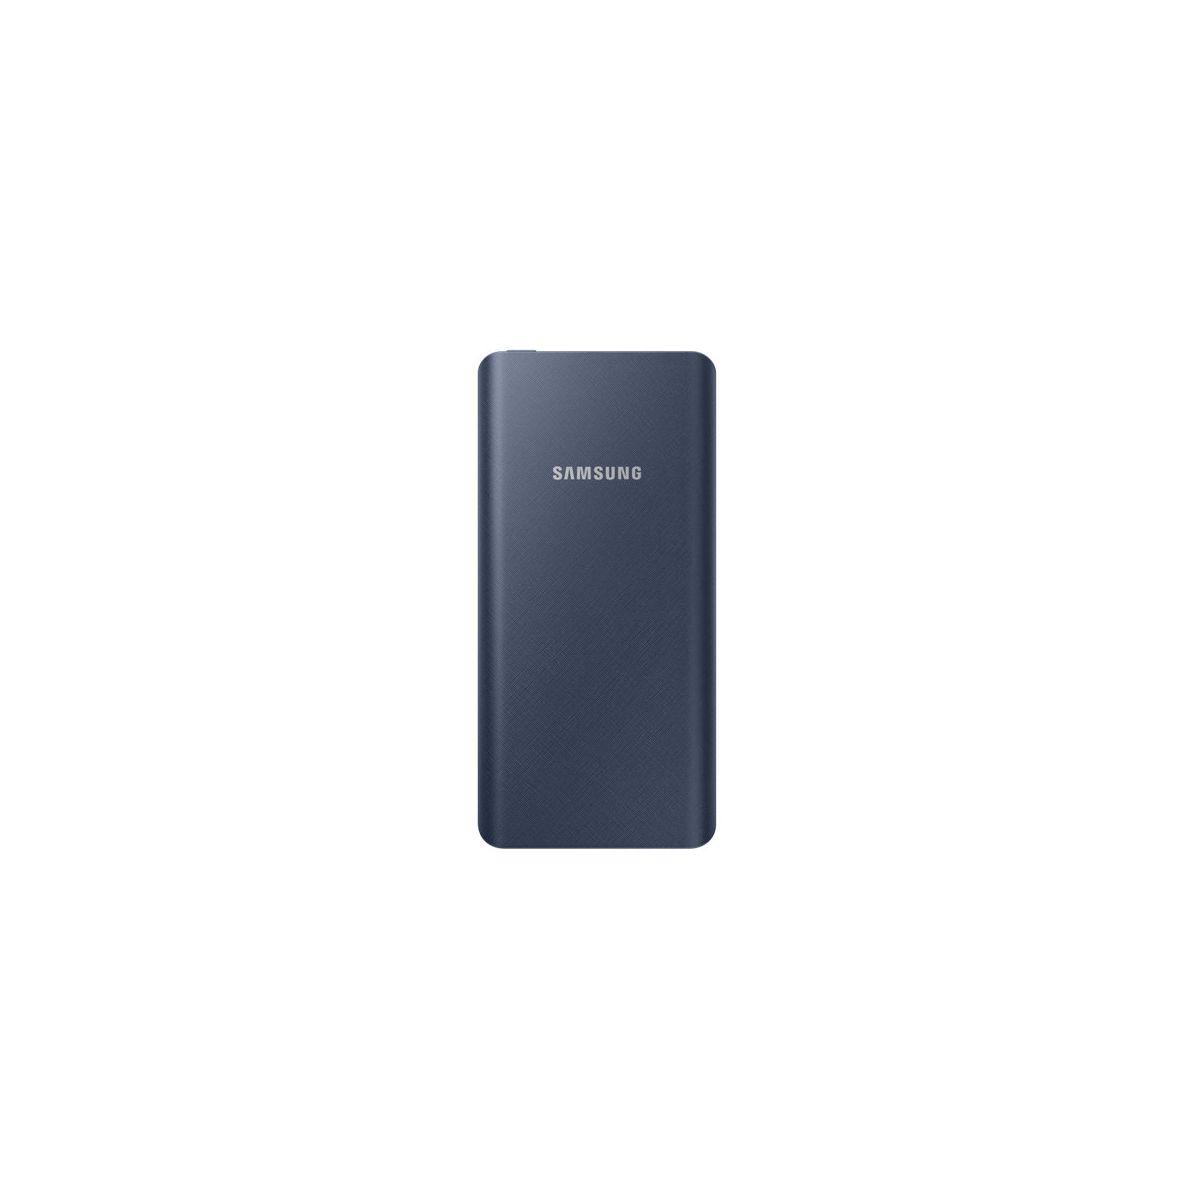 PowerBank SAMSUNG 10000 mAh - Bleu